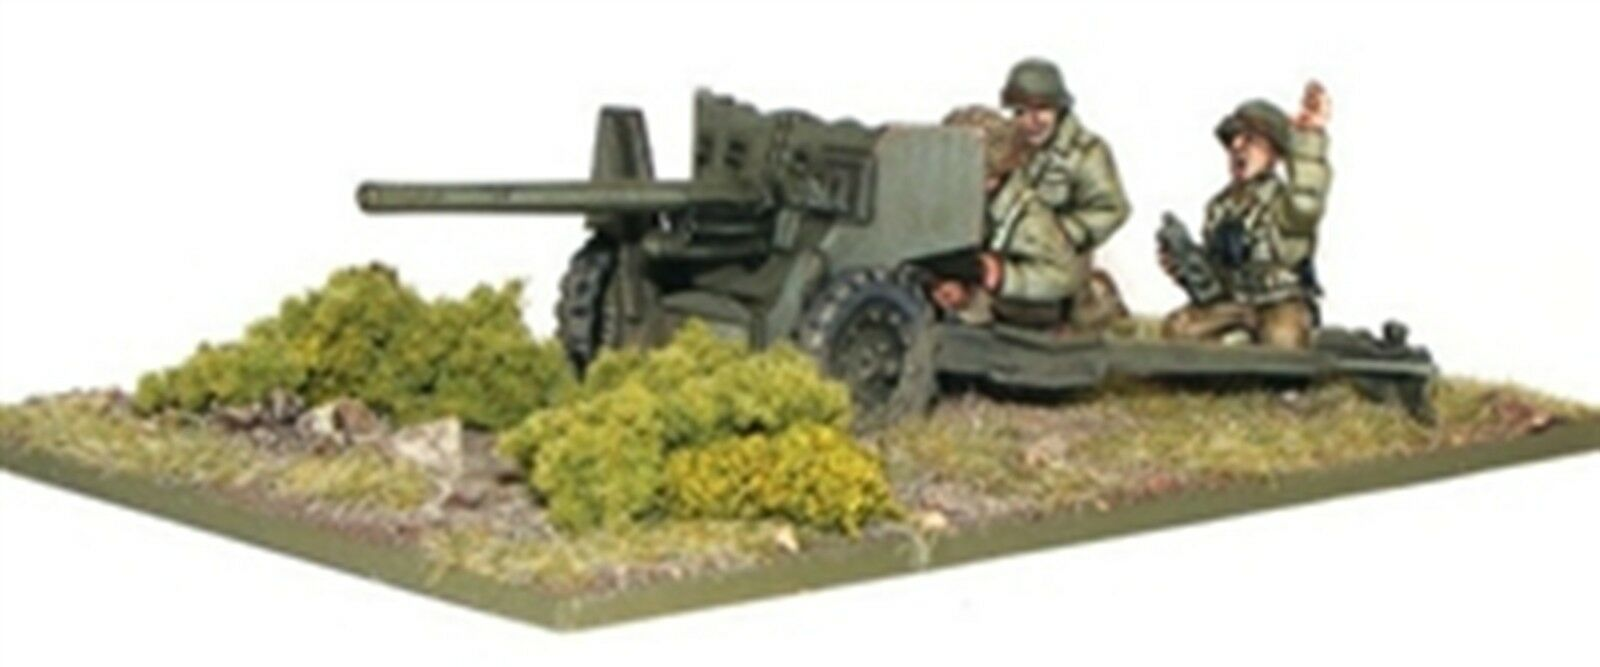 NEW BOLT ACTION MINIATURE US ARMY M1 57MM ANTI-TANK GUN FIGURE GAMES WGB-AI-30